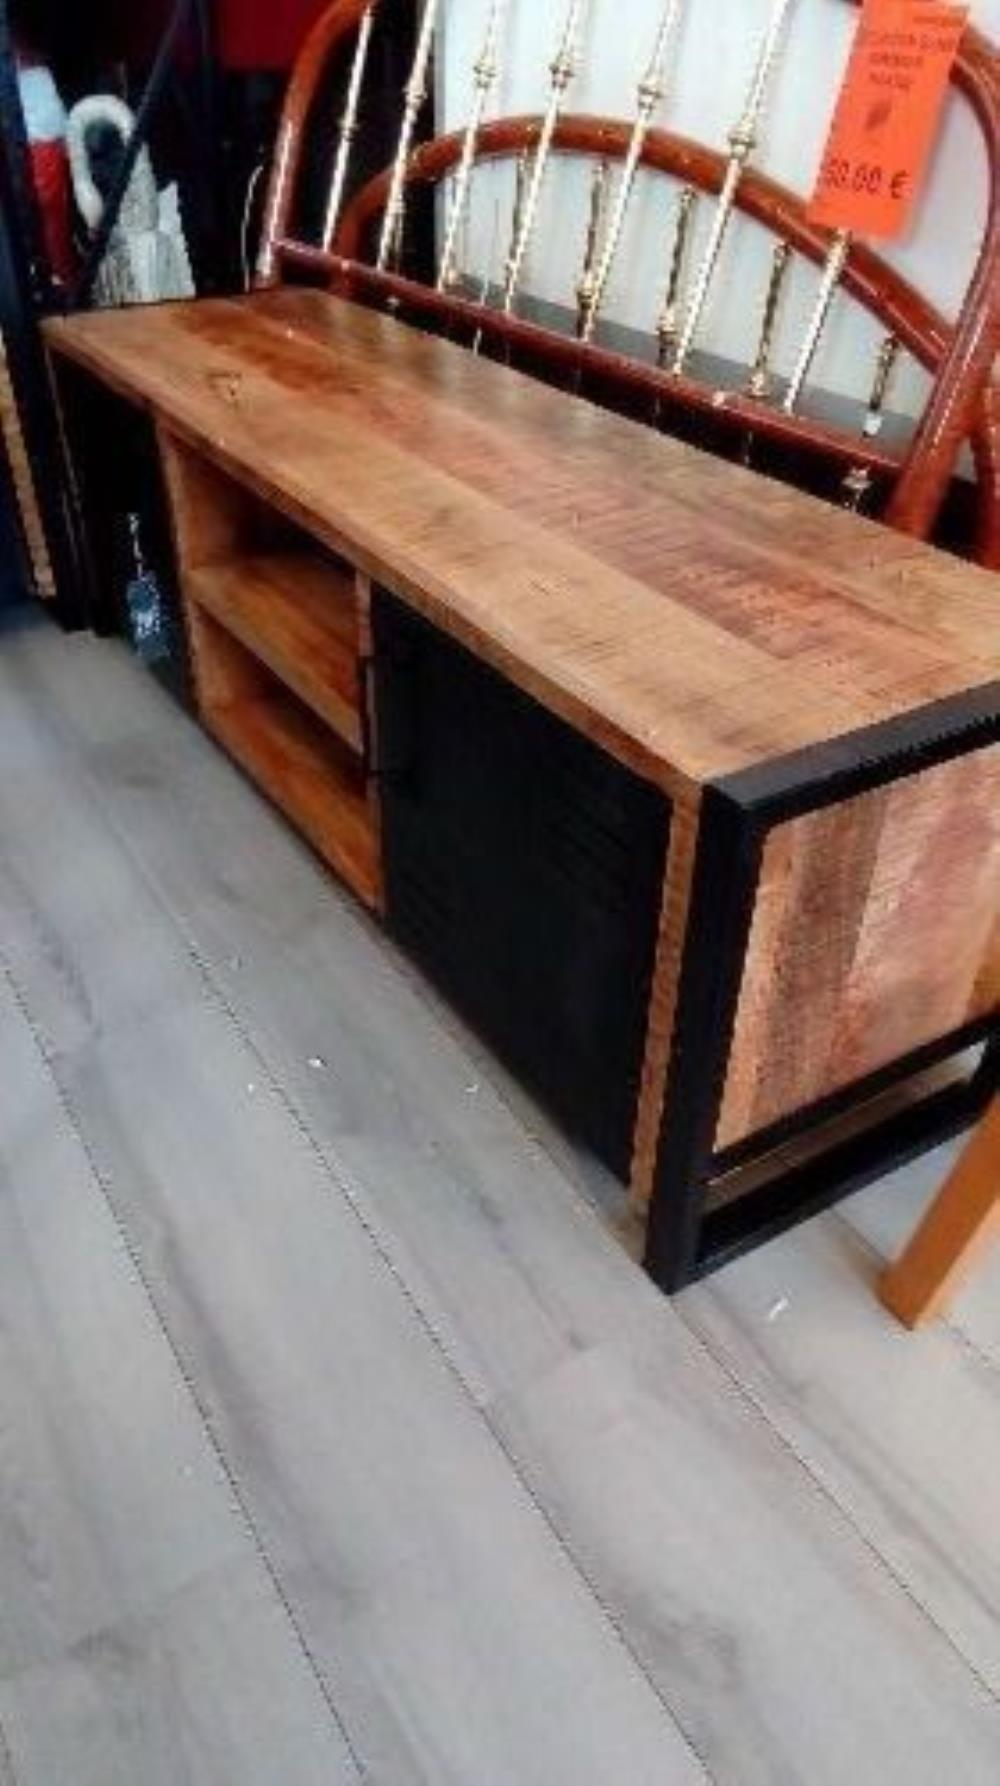 articles neufs troc richwiller. Black Bedroom Furniture Sets. Home Design Ideas